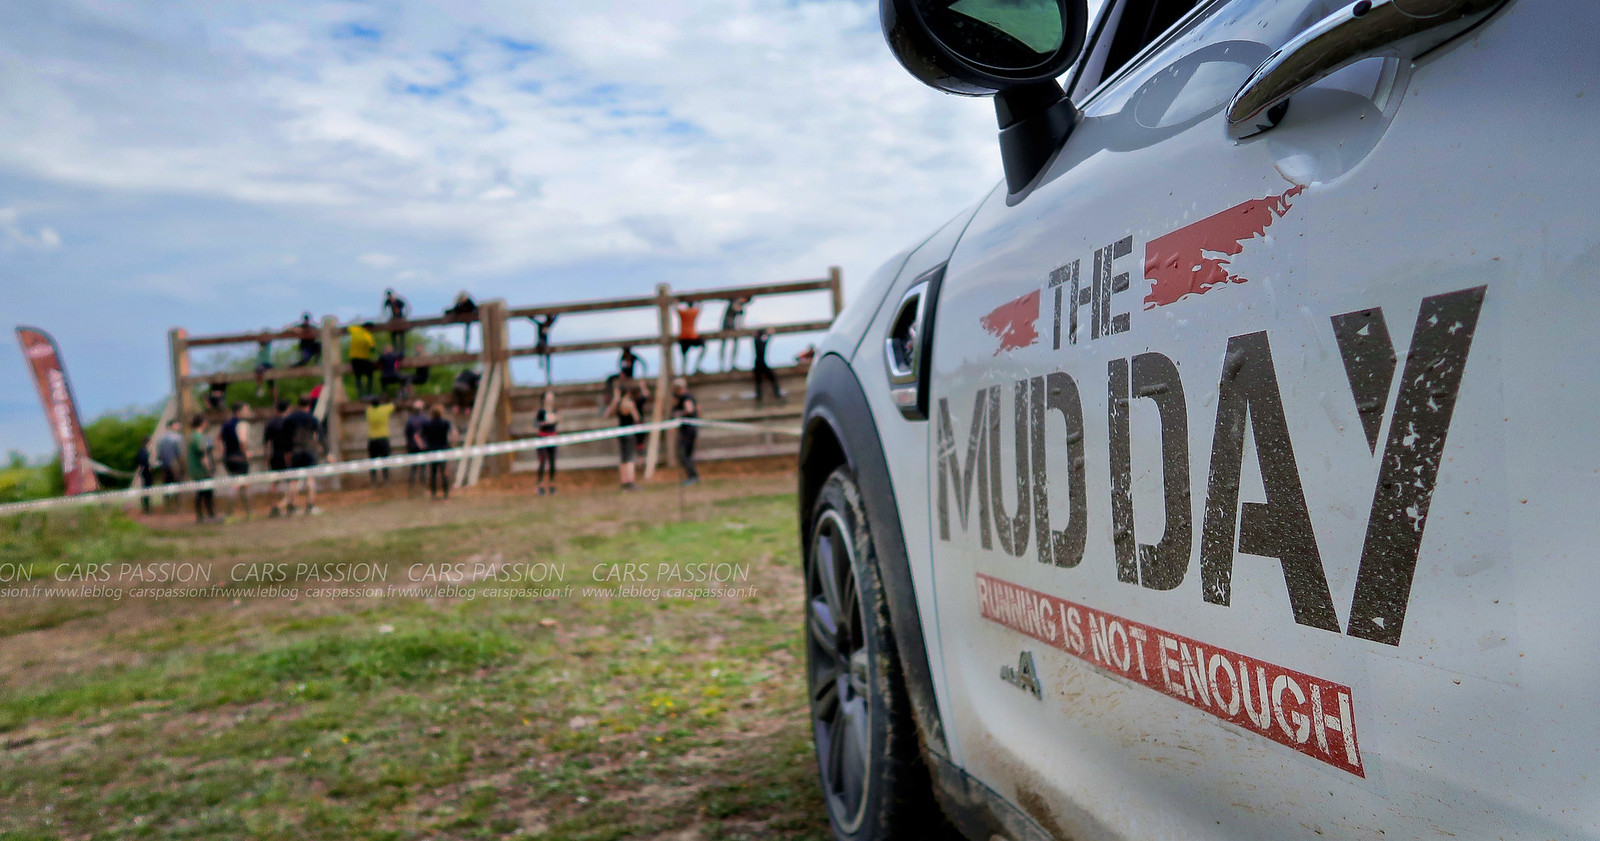 The Mud Day 2017 Paris avec Mini FR